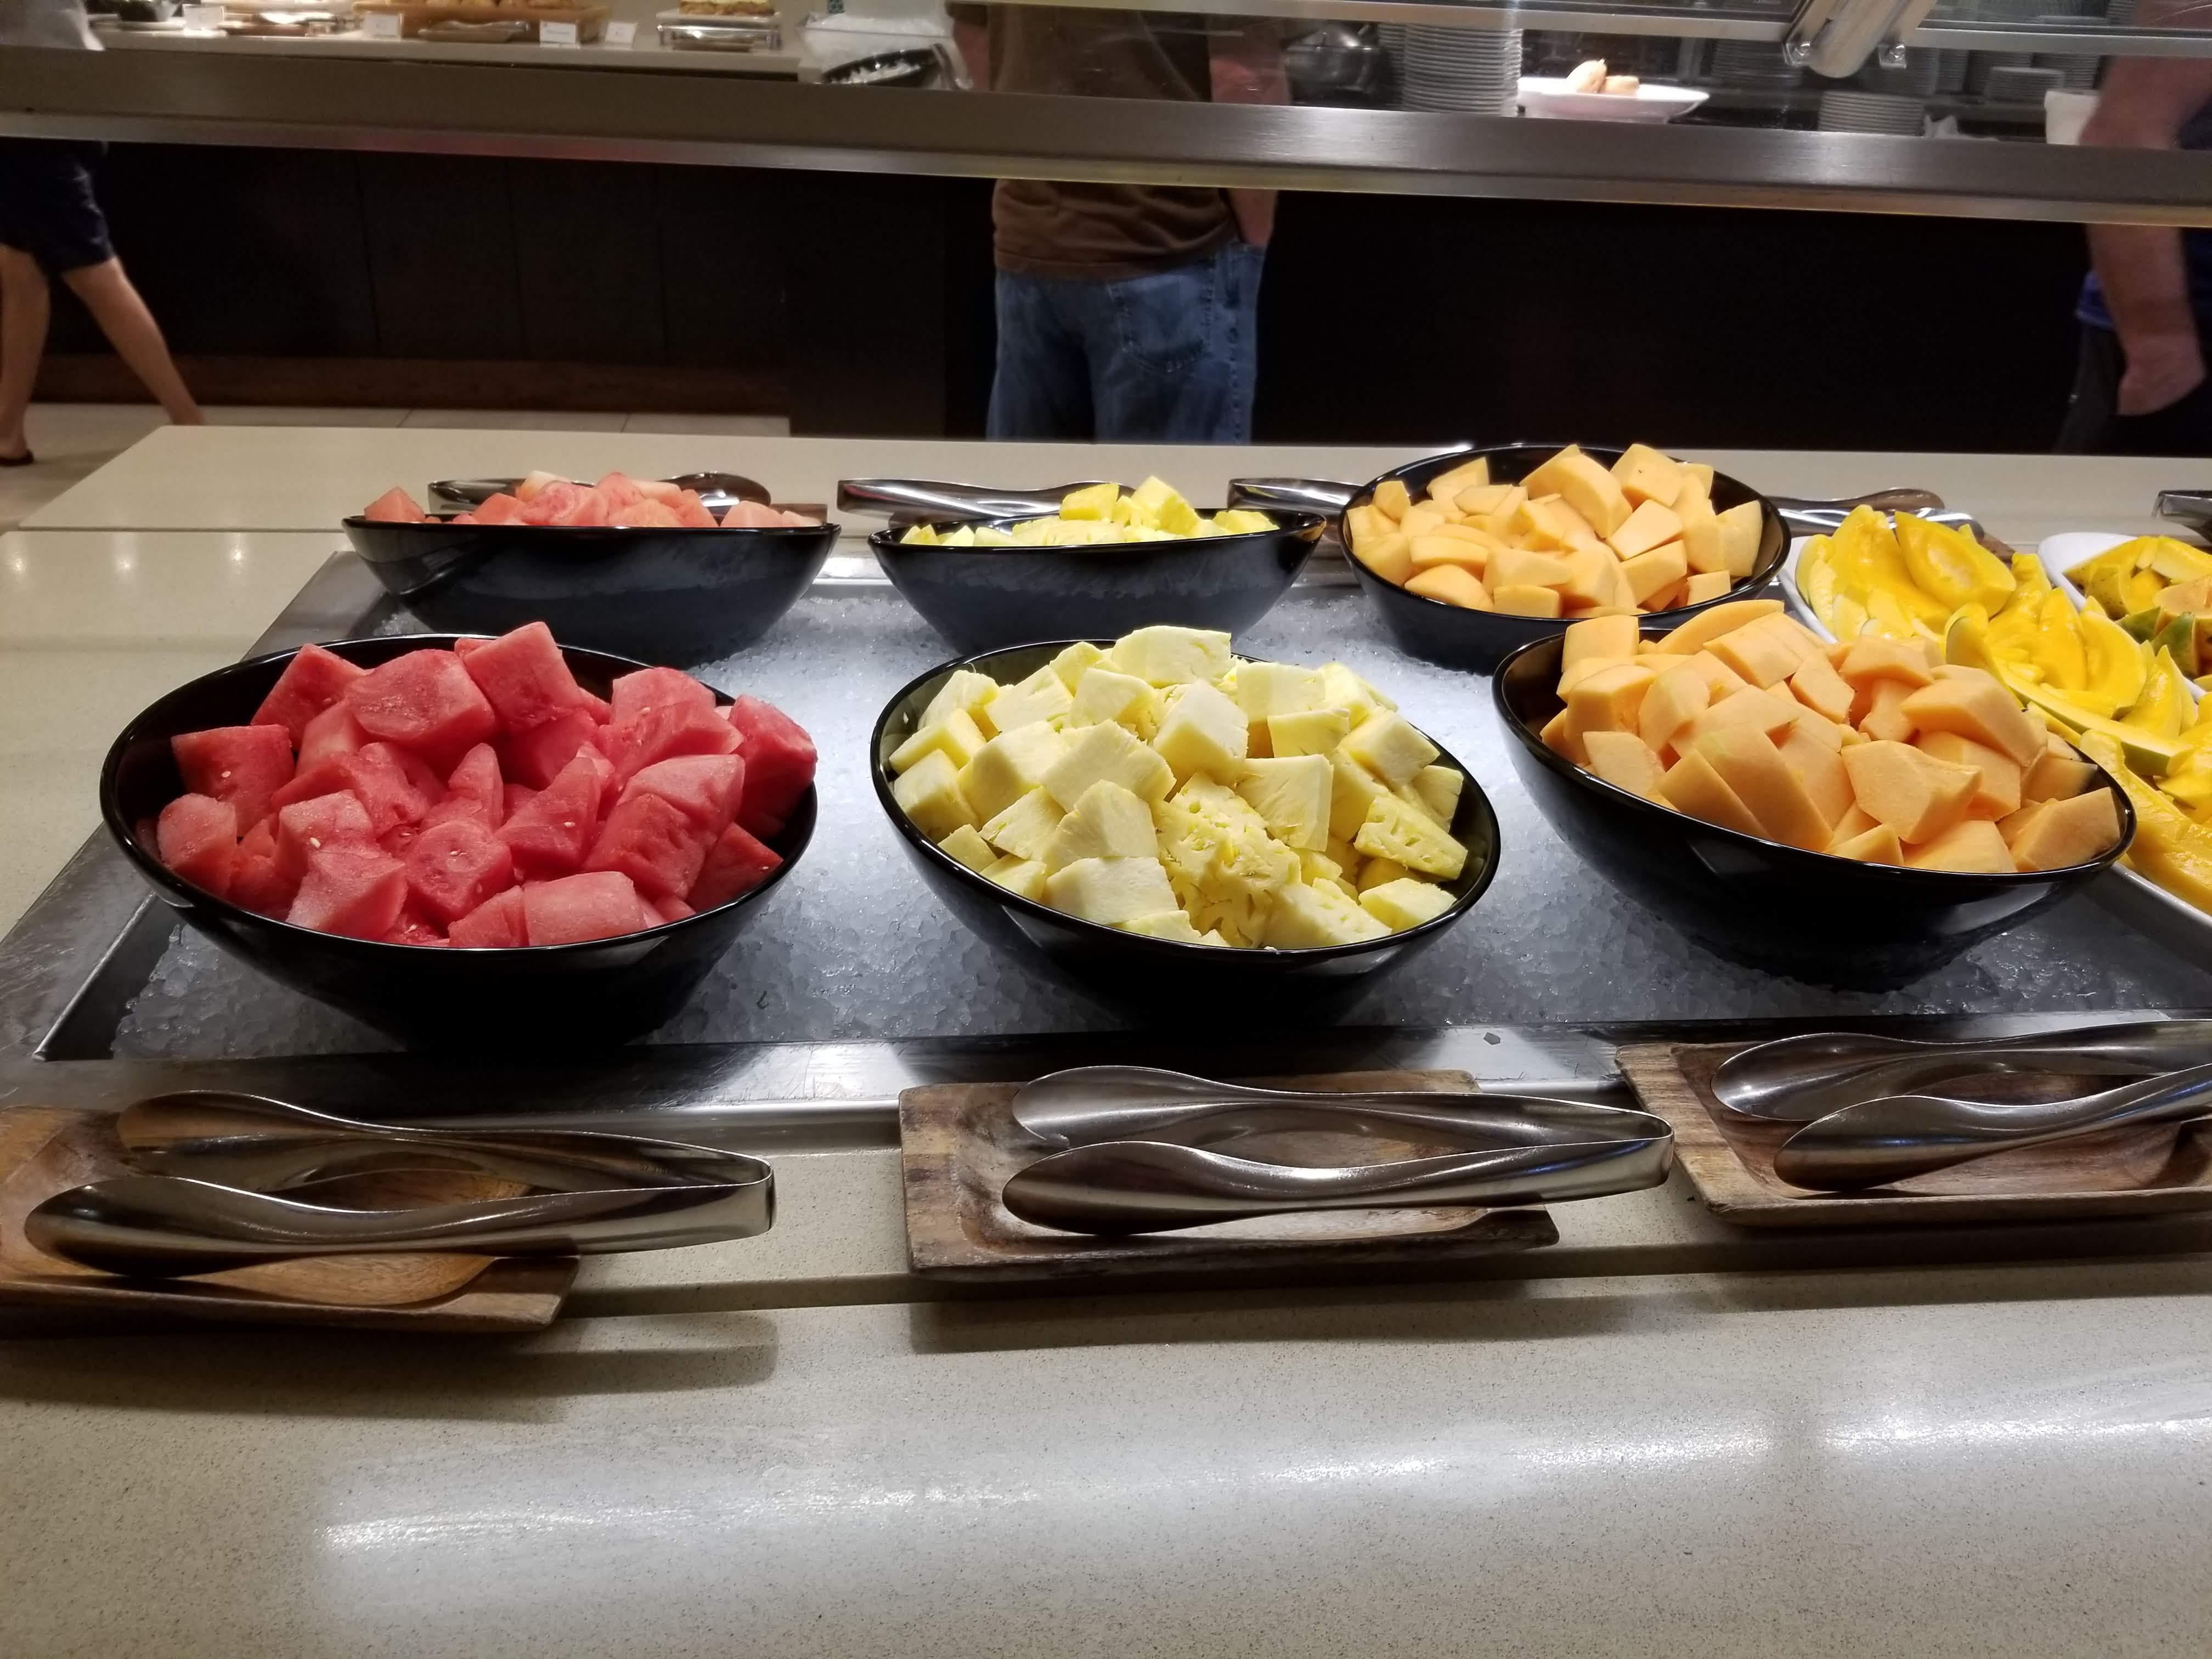 Fresh cut fruit part of the breakfast buffet at the Waikiki Marriott Resort & Spa